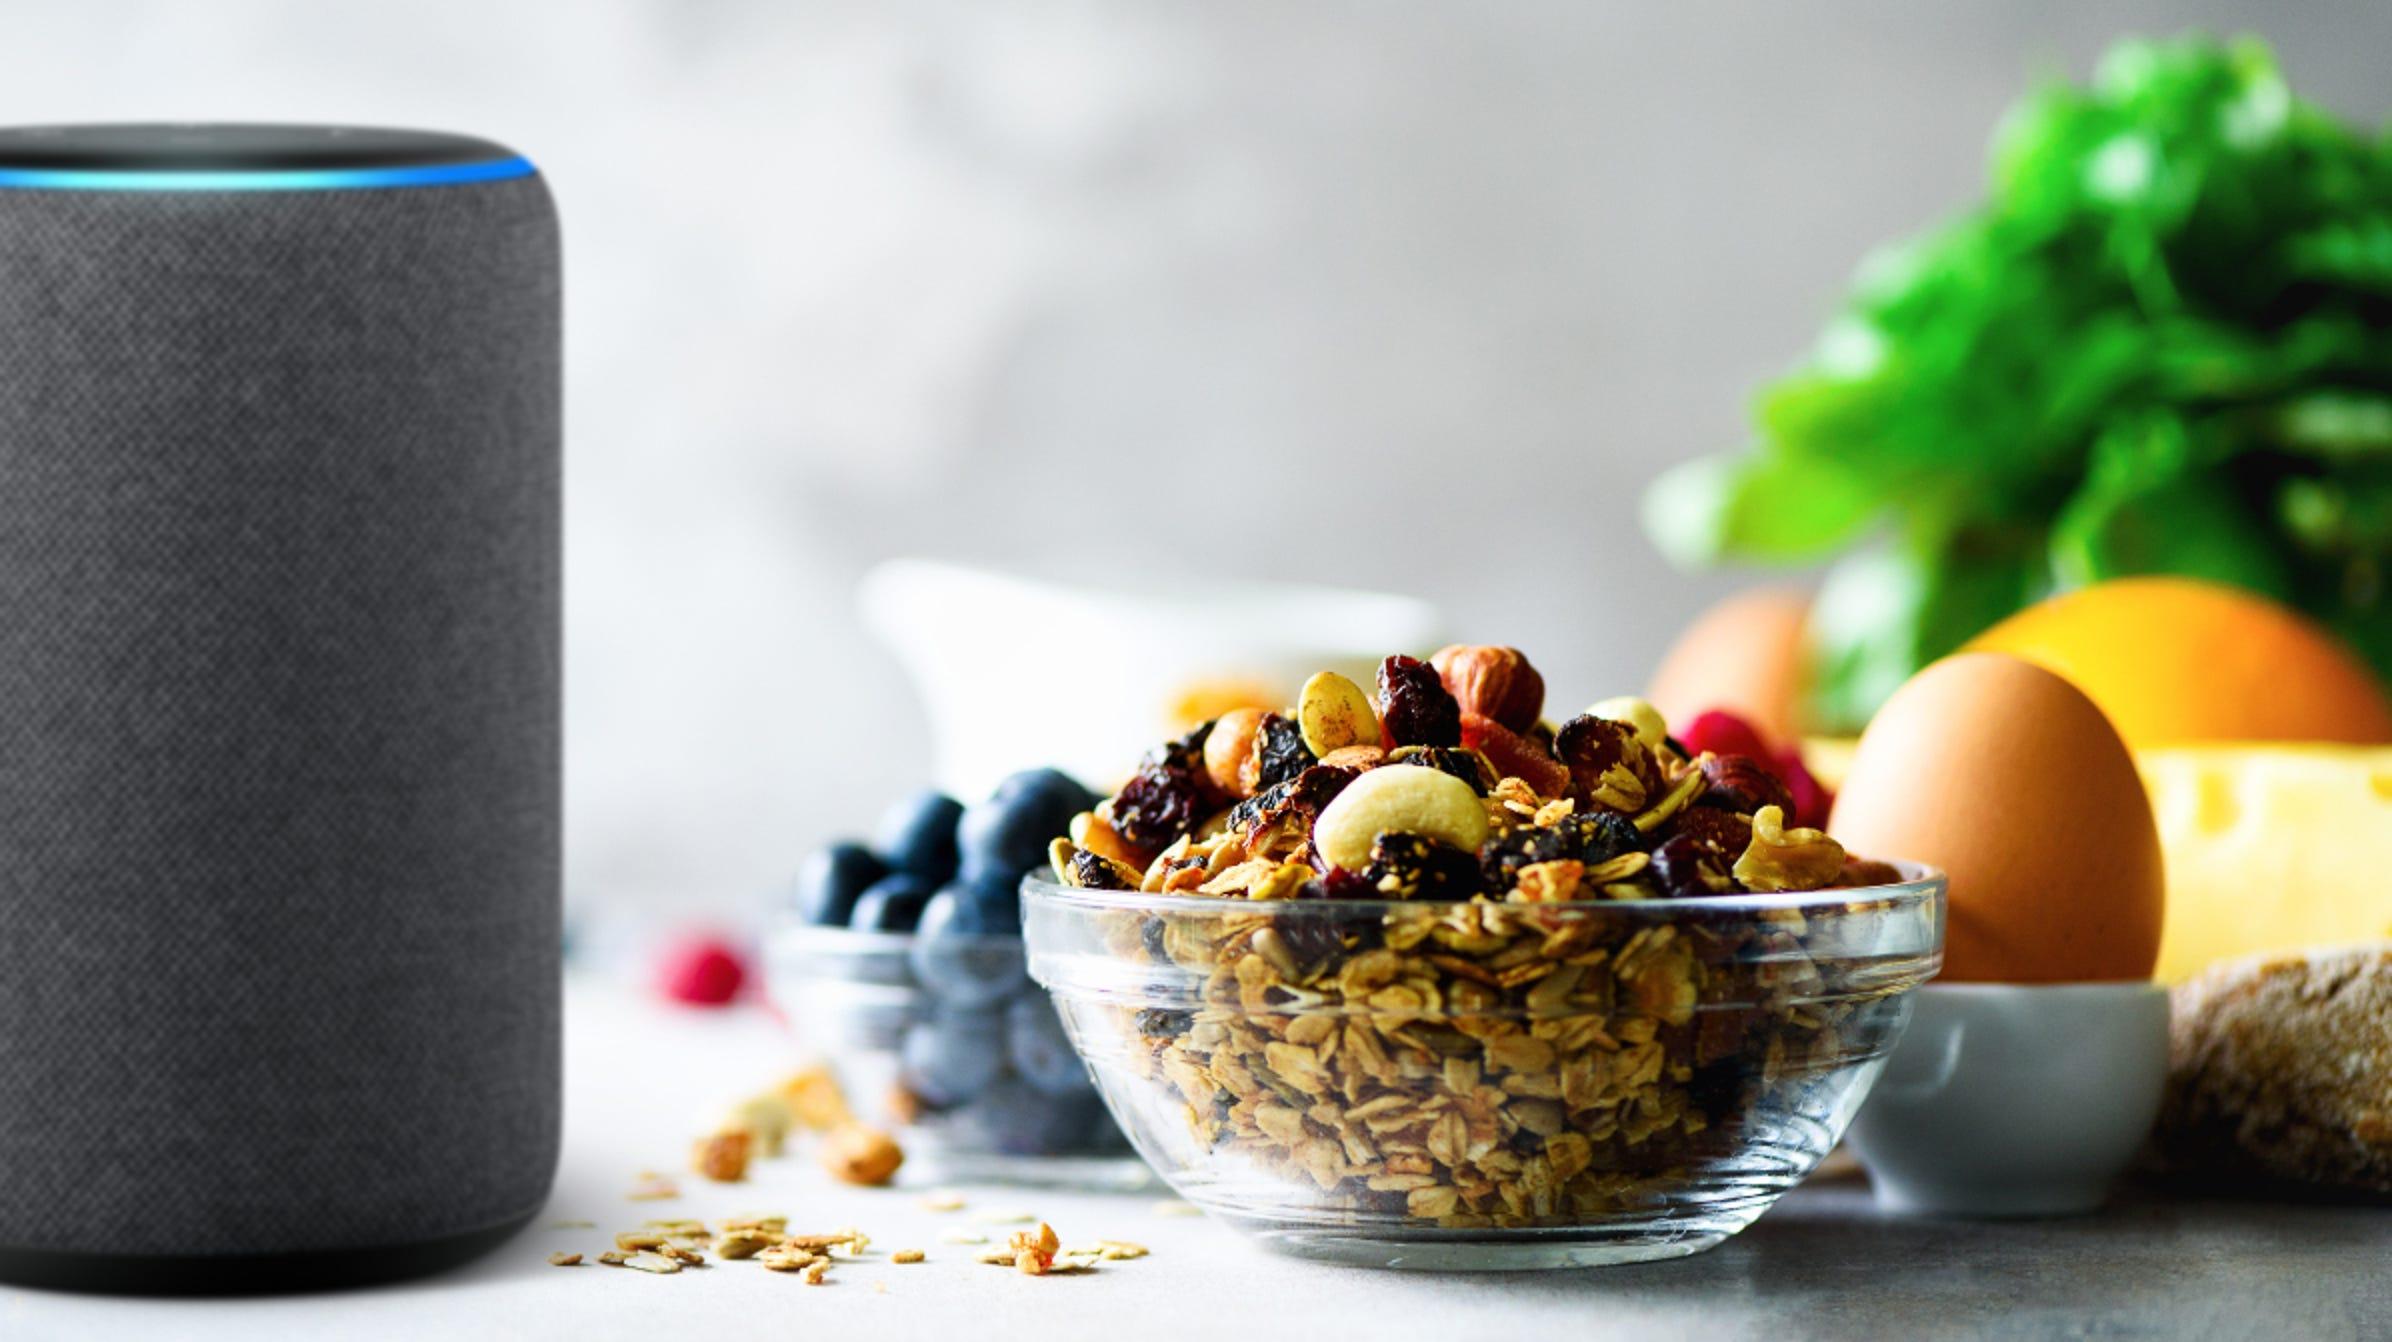 Cómo pedir comestibles con Amazon Alexa